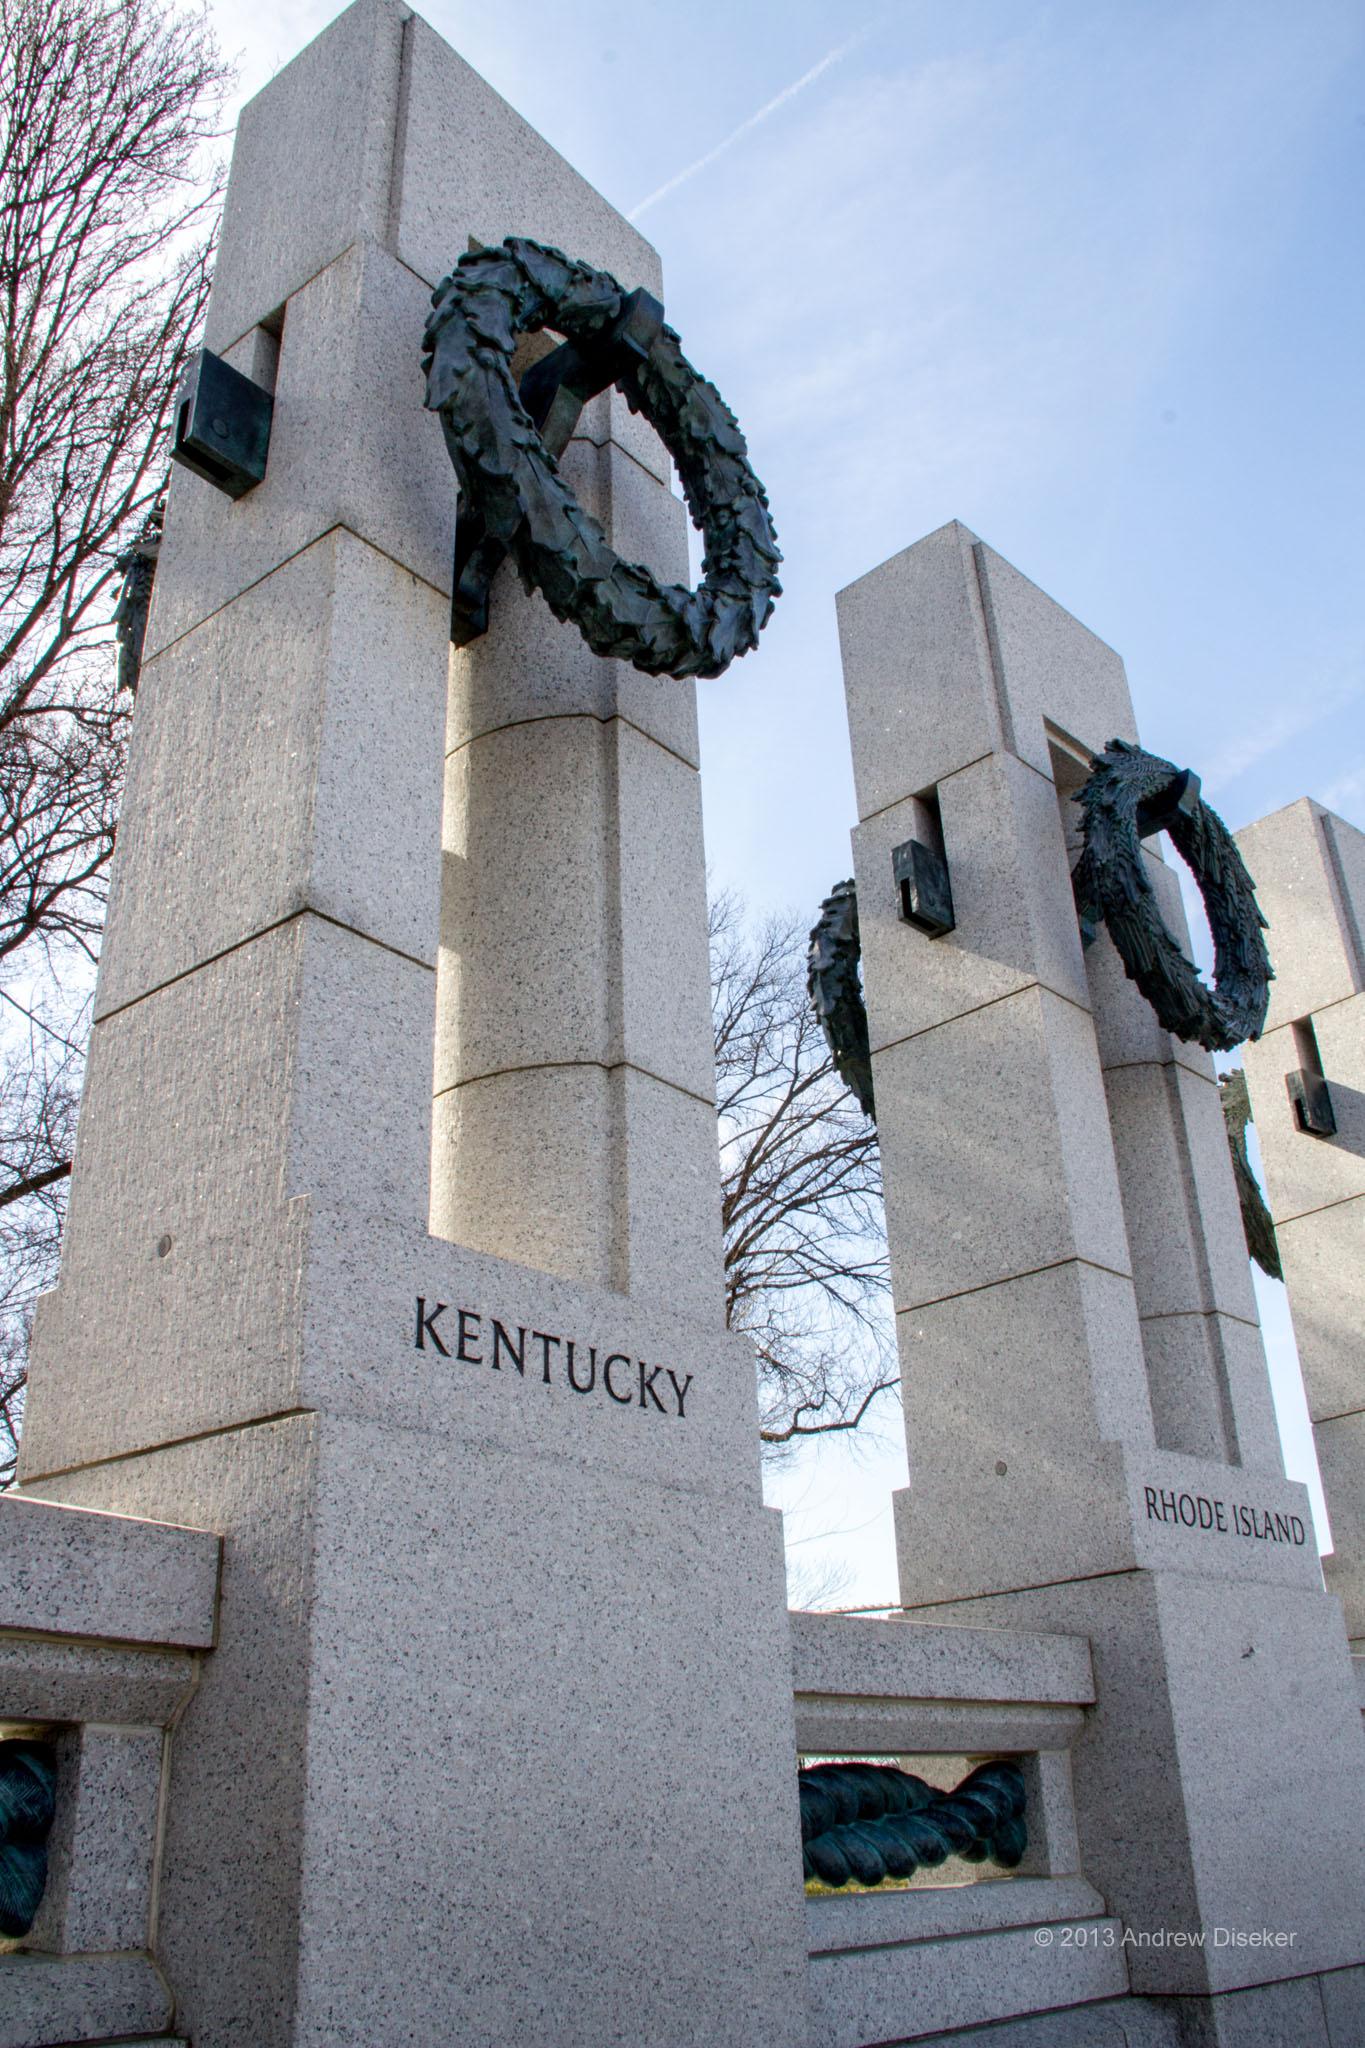 Memorial pillar for states of Kentucky and Indiana